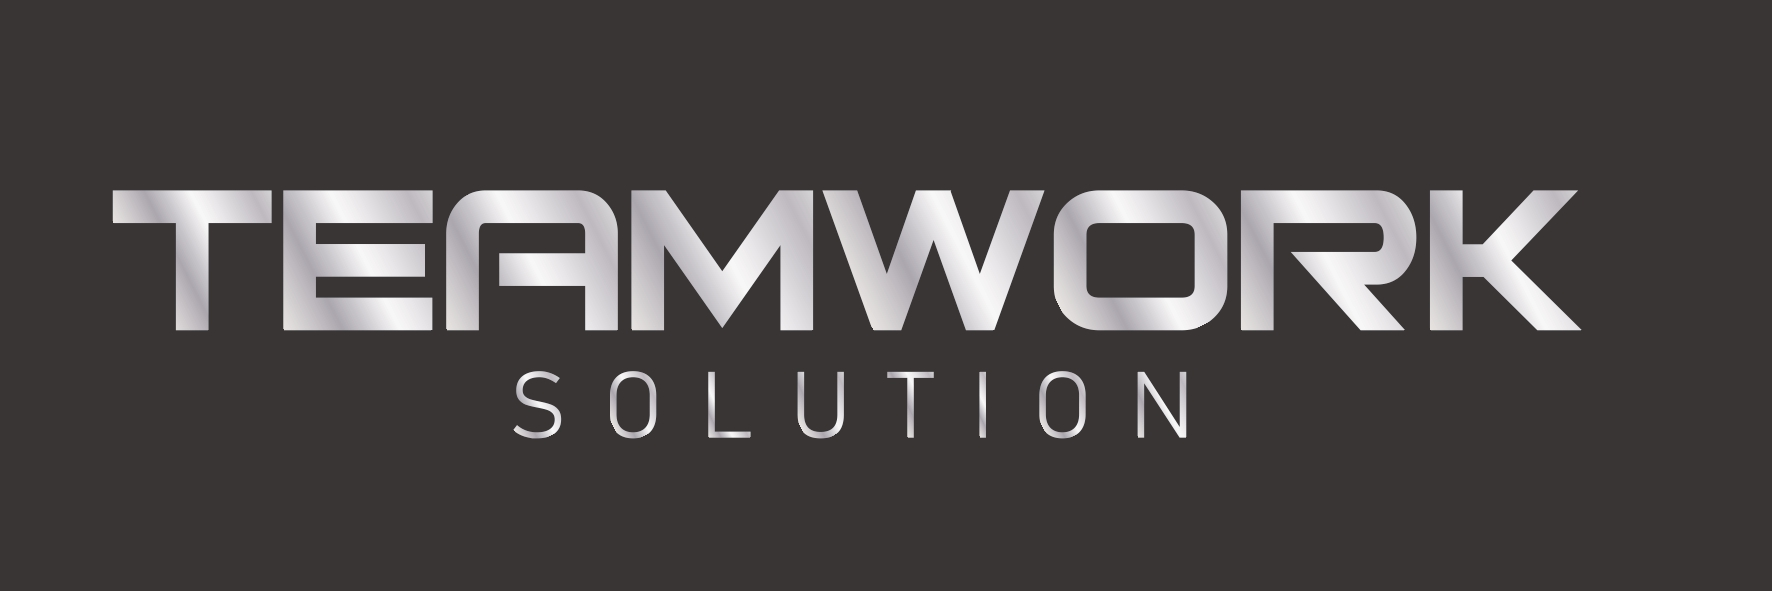 http://usepmm.fr/wp-content/uploads/2021/03/Teamwork-solution-gris_page-0001.jpg